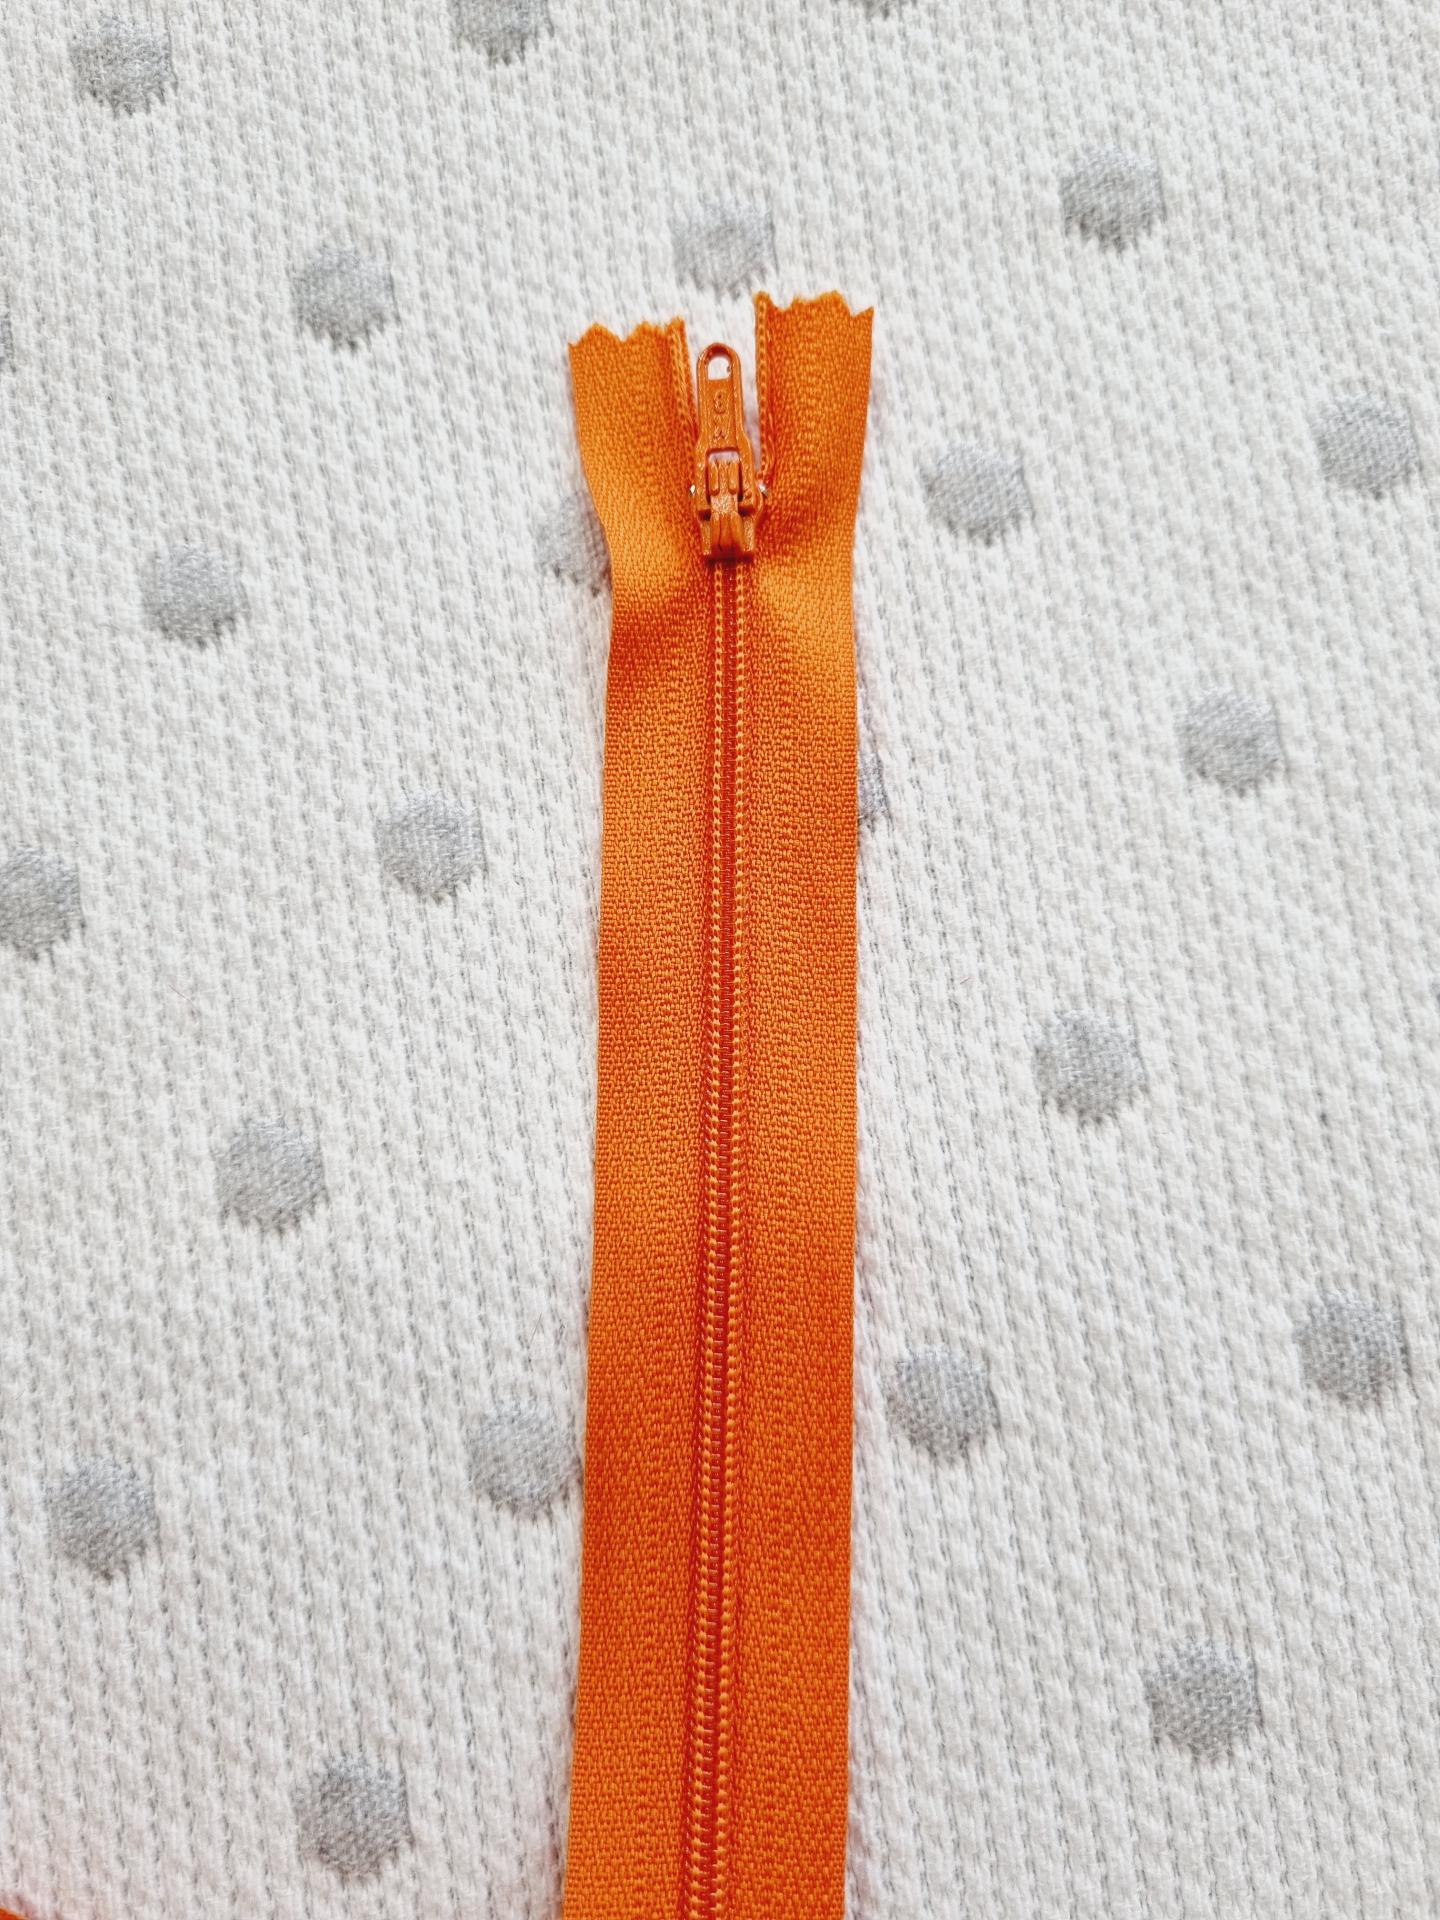 Cremallera Cerrada Naranja 540